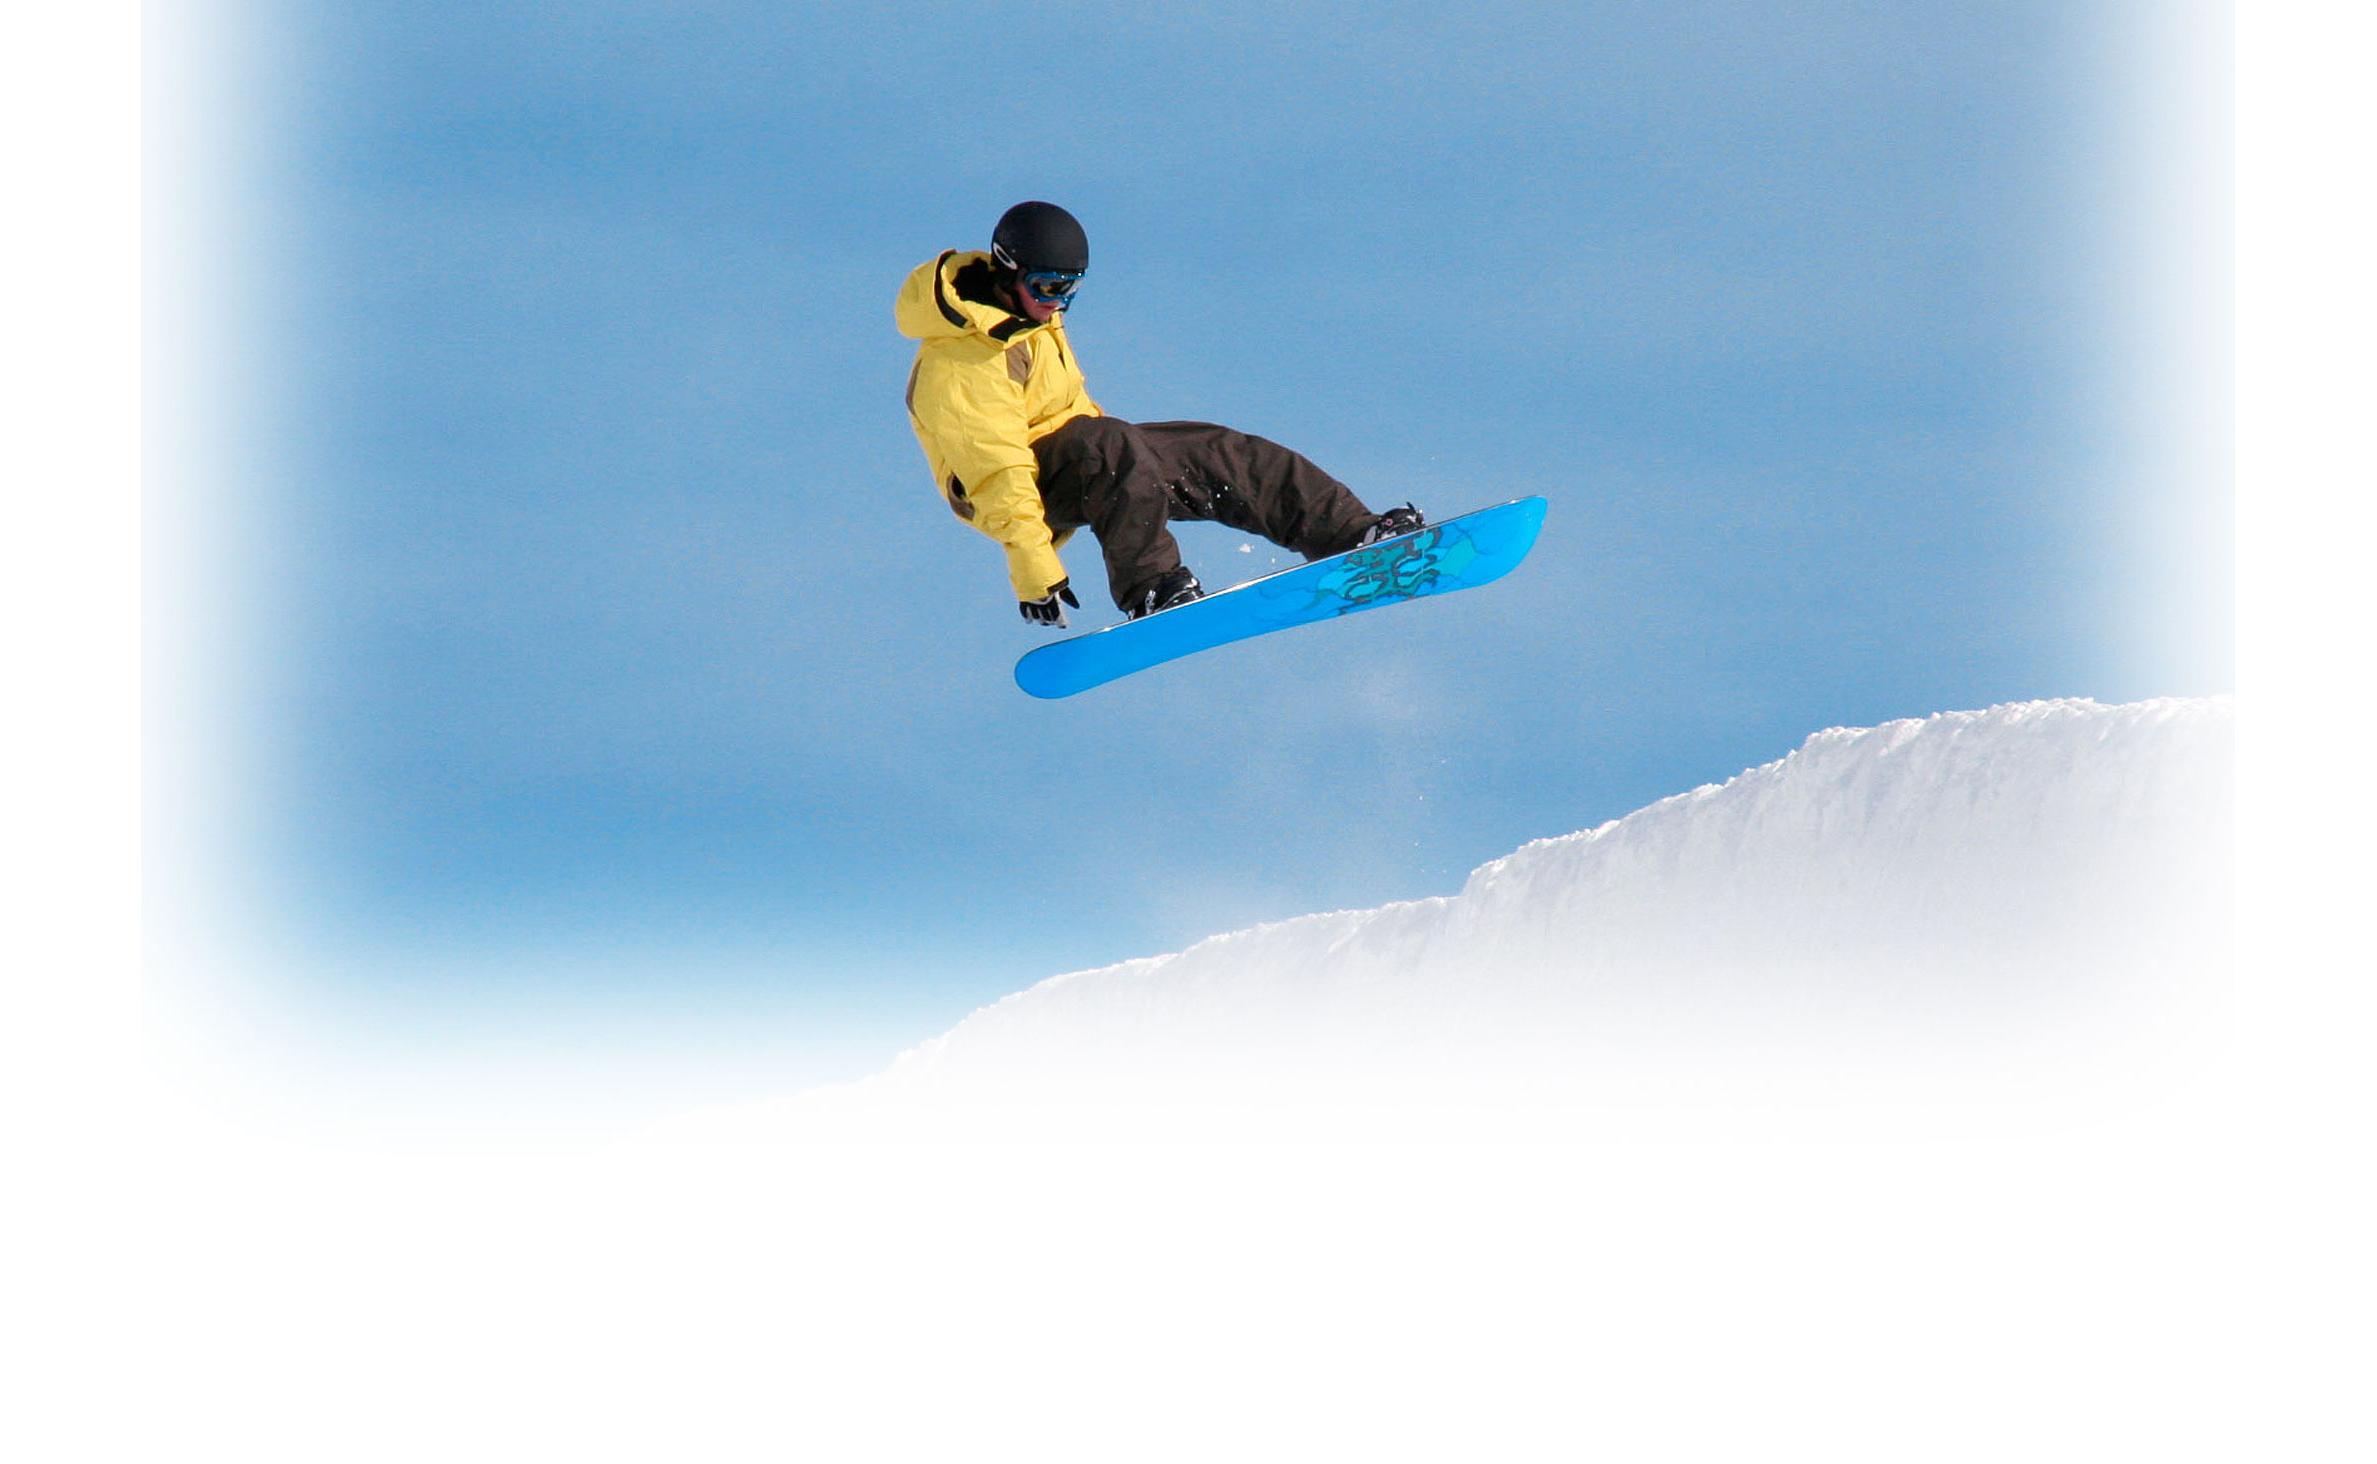 ALETSCHARENA-SNOW-BOARD-FAMILIEN-WILLKOMMEN.jpg